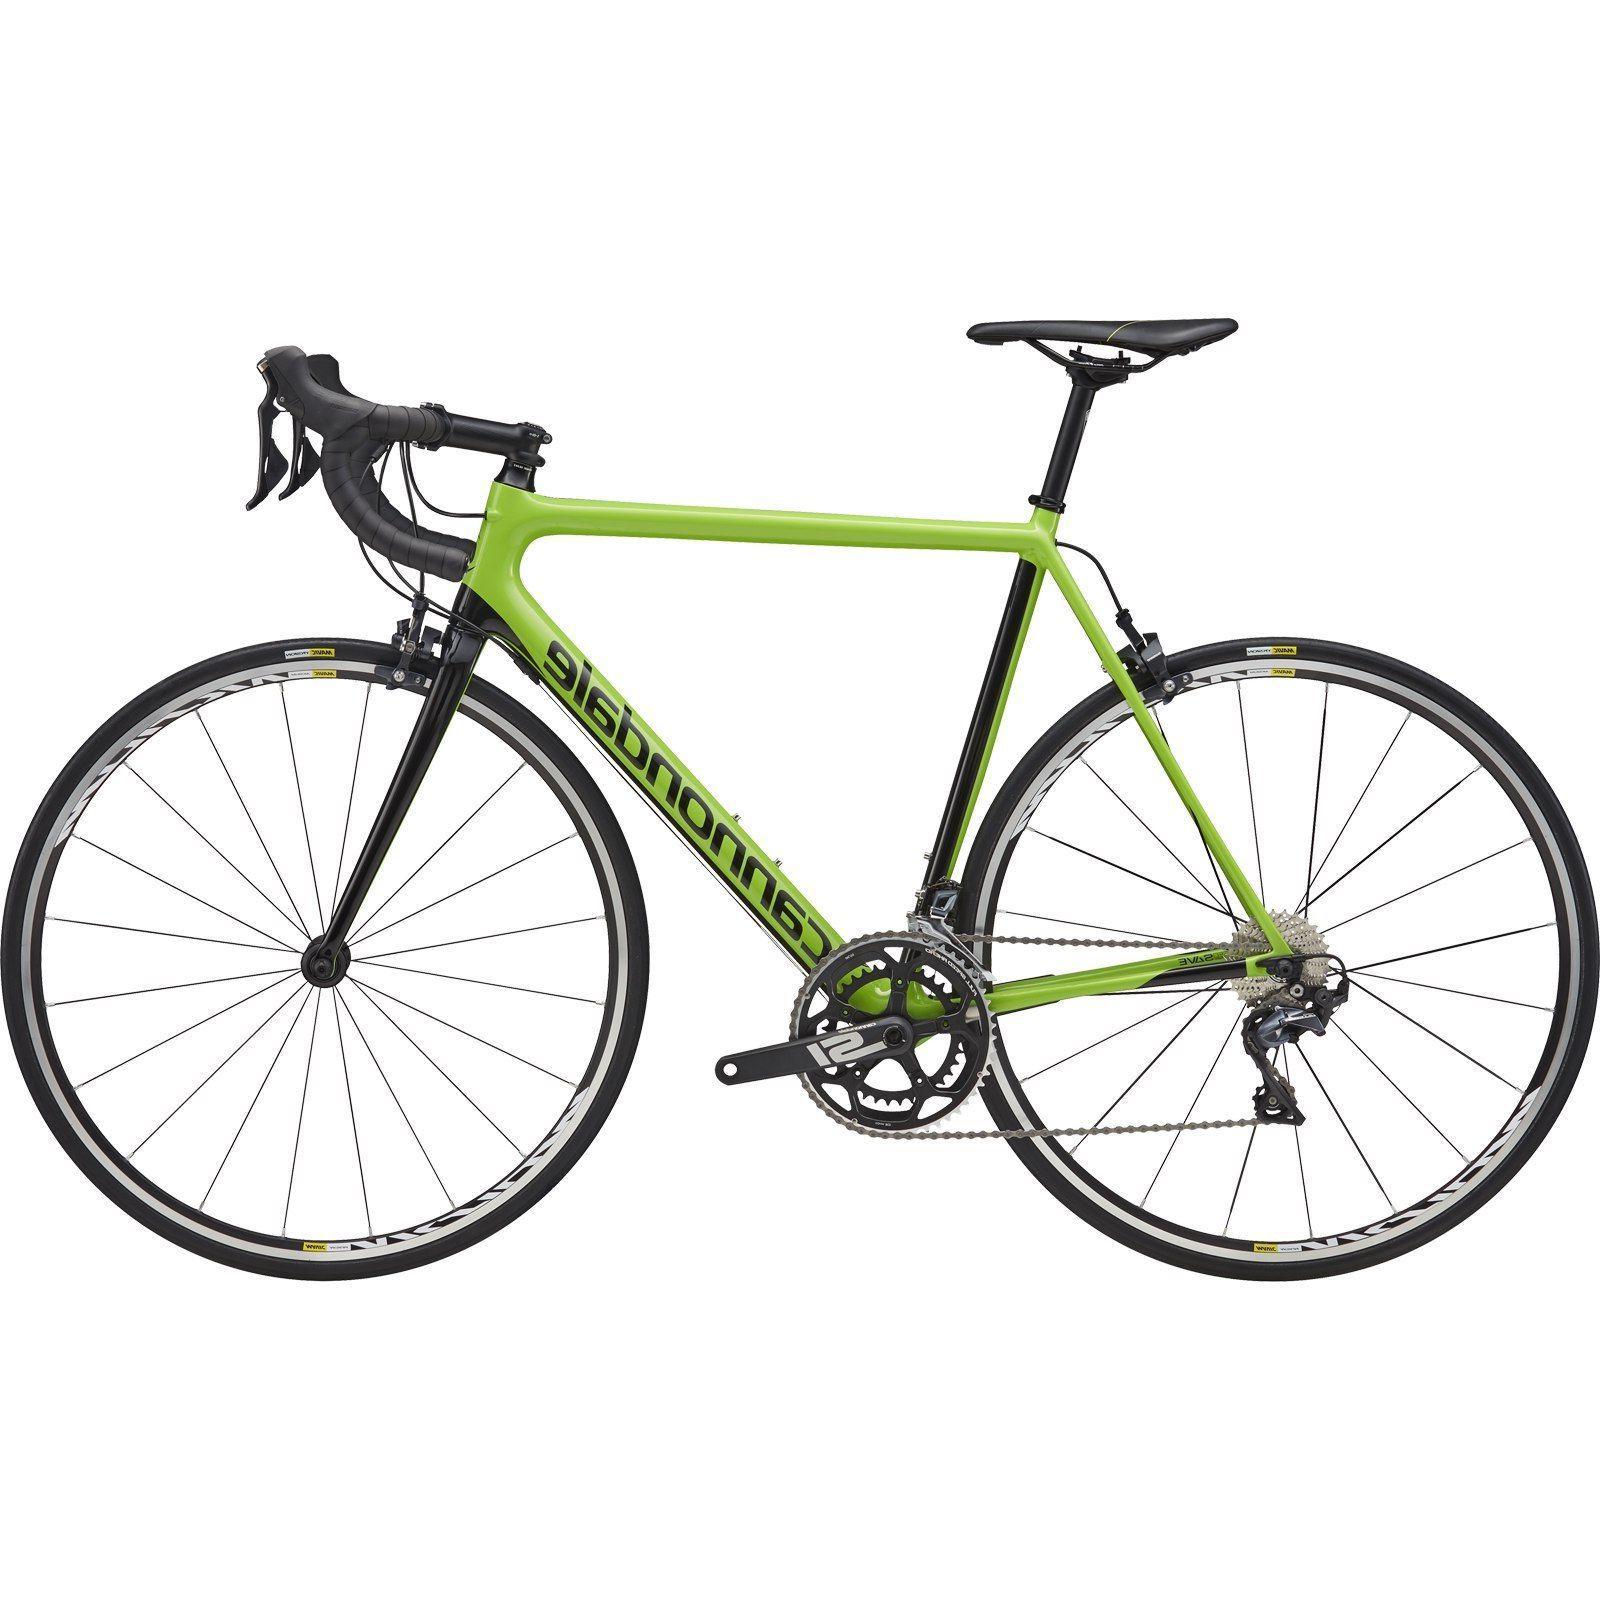 2018 Cannondale SUPERSIX EVO Ultegra Carbon Road Bike 60cm